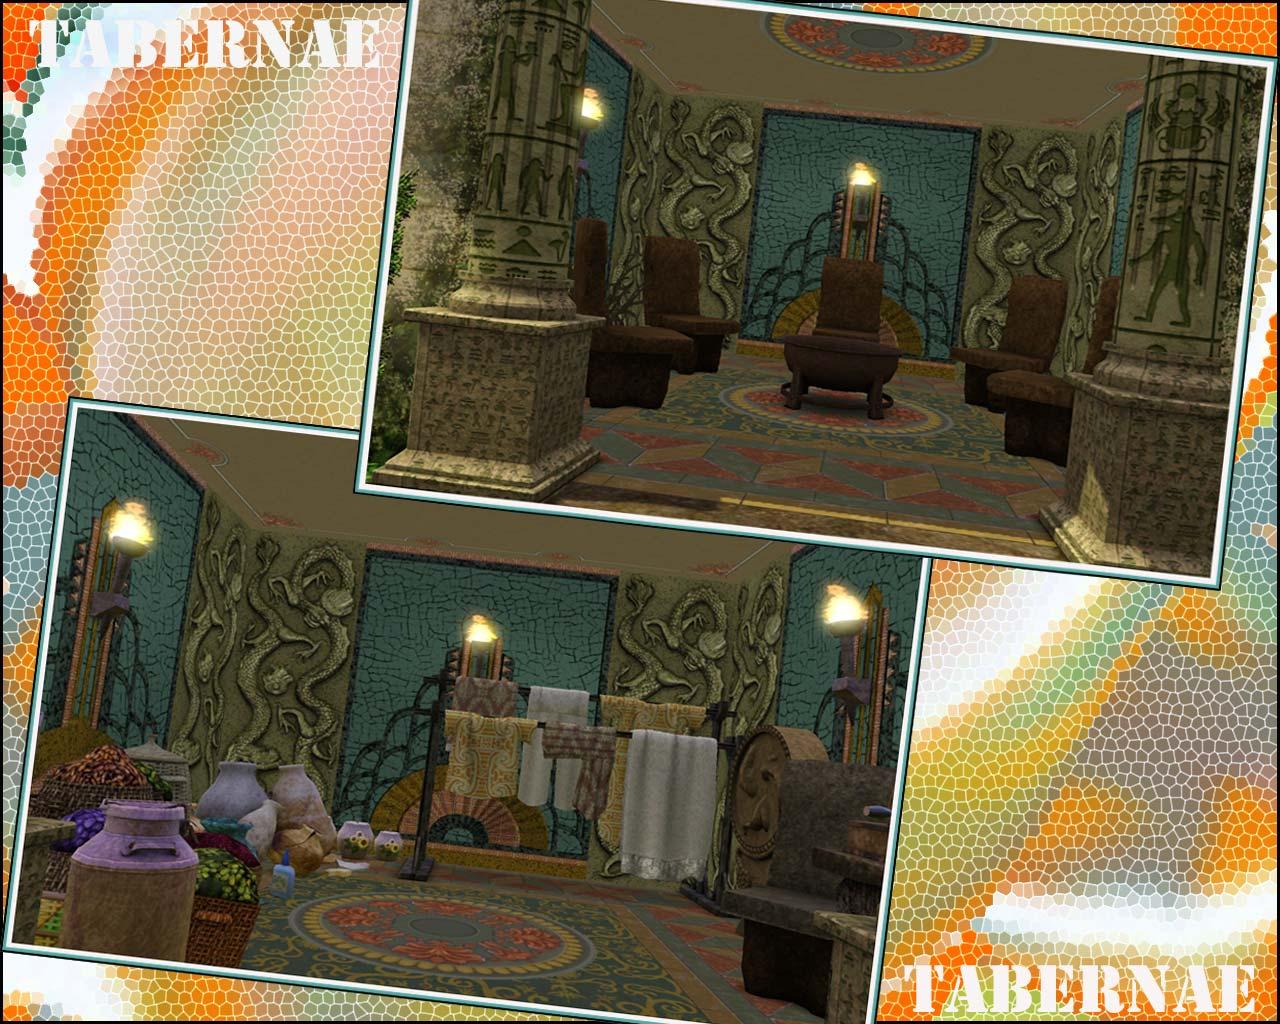 Aaron Spelling Mansion Floor Plan My Sims 3 Blog Ancient Roman Home No Cc By Yogi Tea